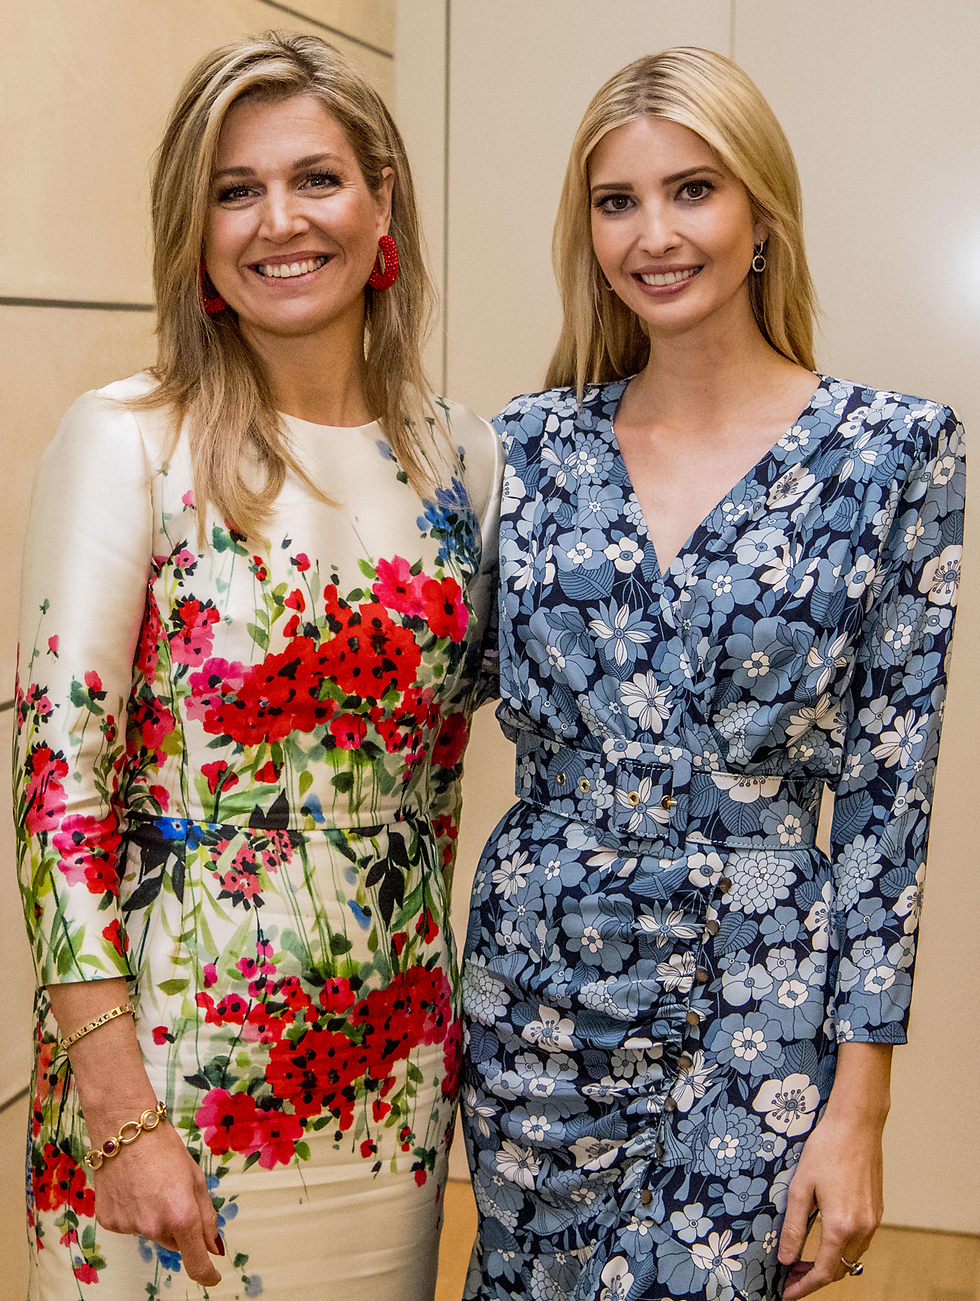 Иванка Трамп и голландская королева Максима - обе в цветочном. Фото: MCT